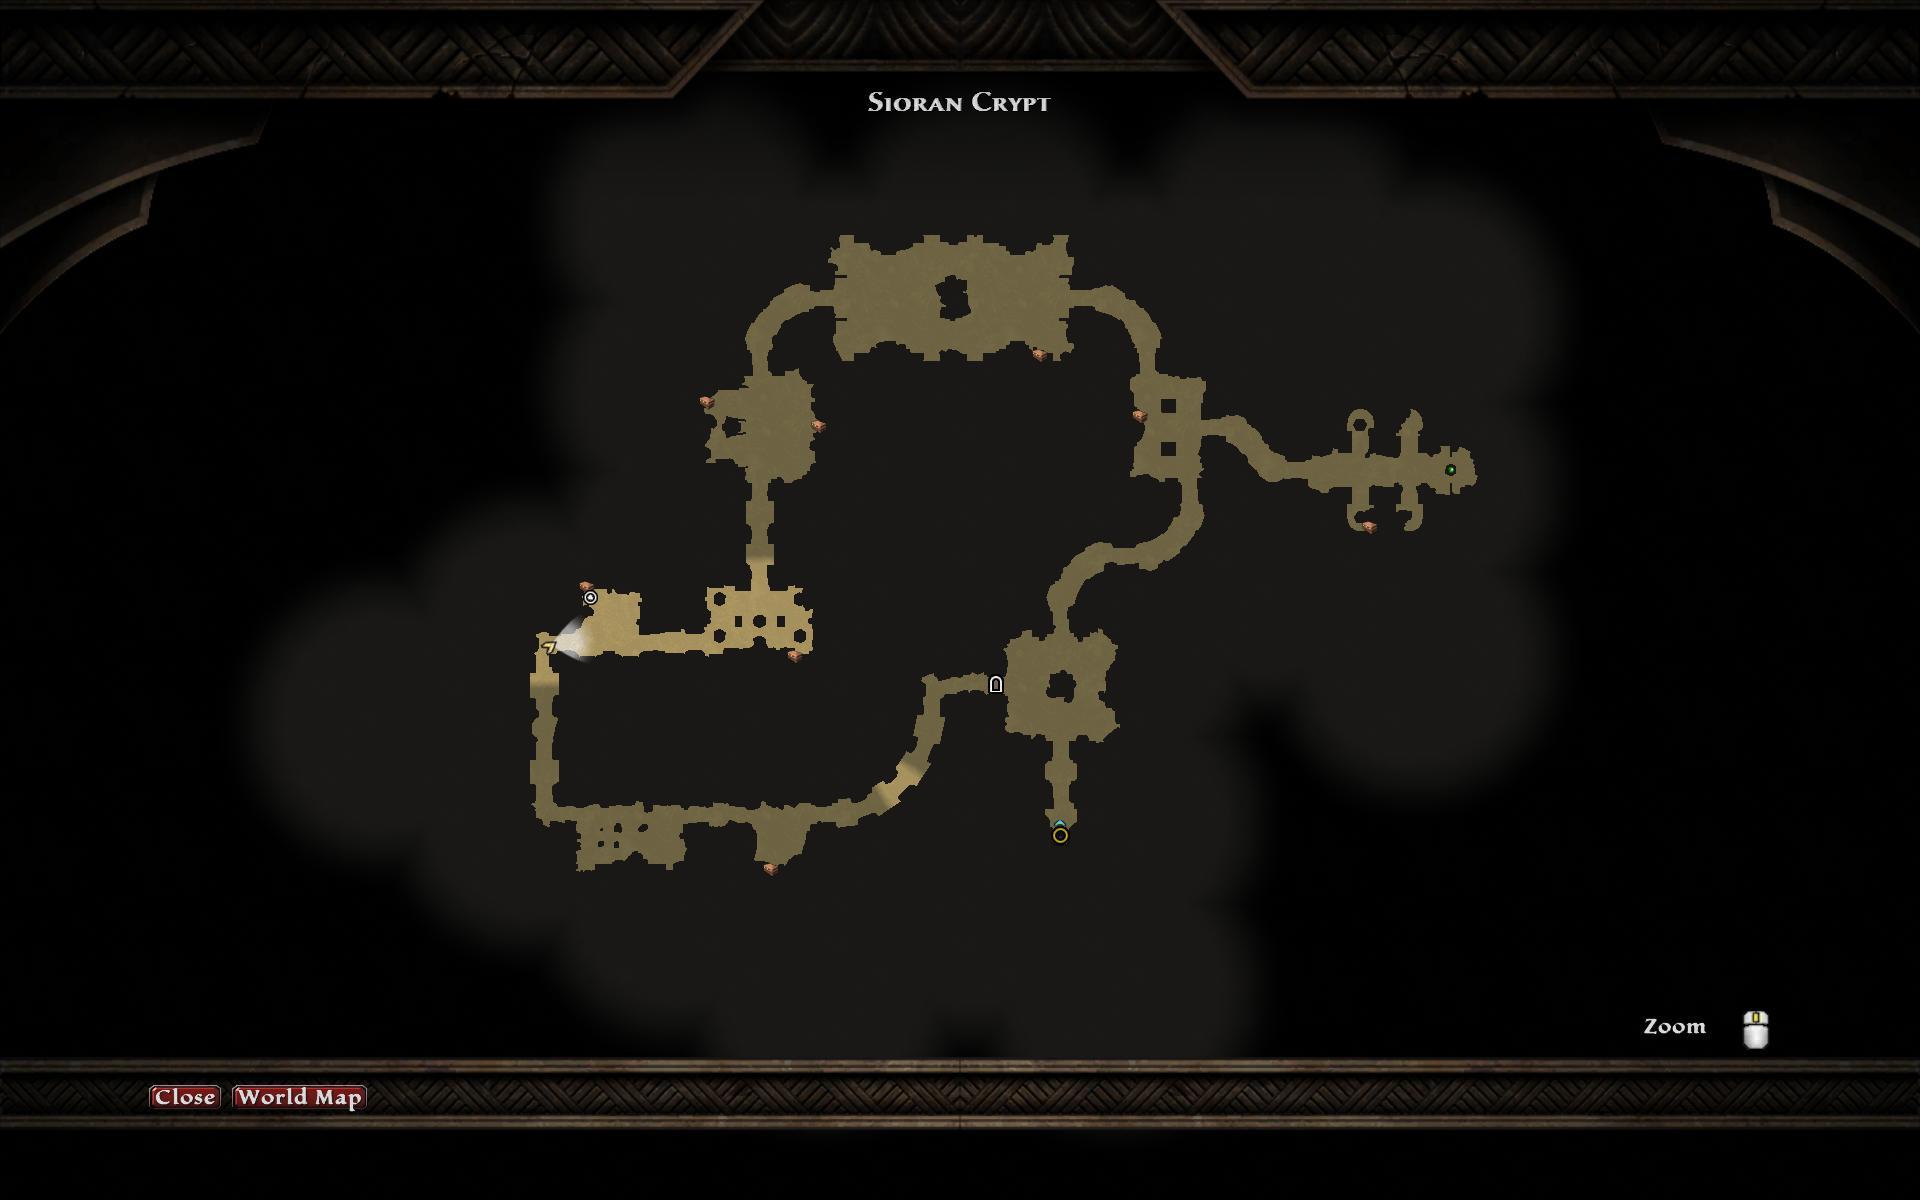 Sioran Crypt Map.jpg